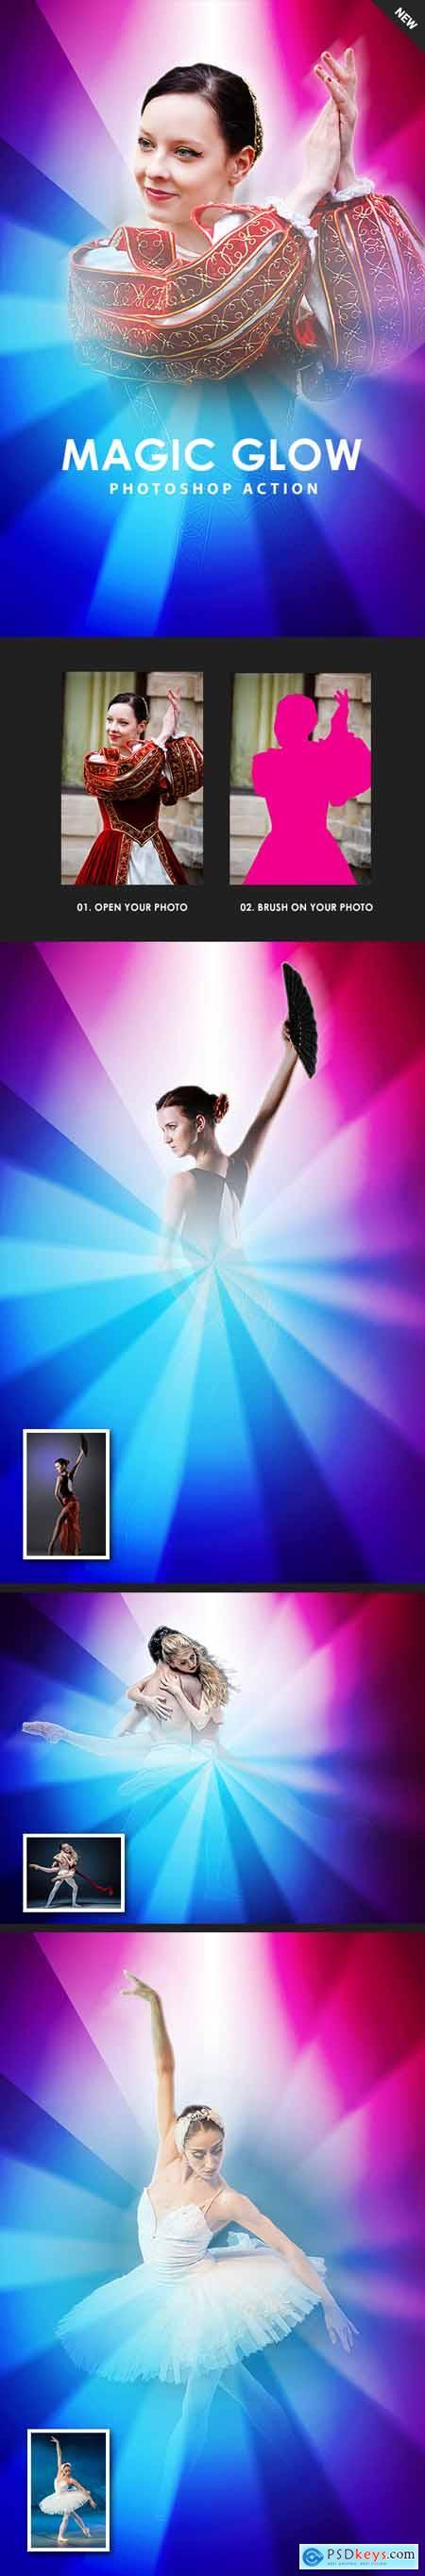 Magic Glow Photoshop Action 24671976